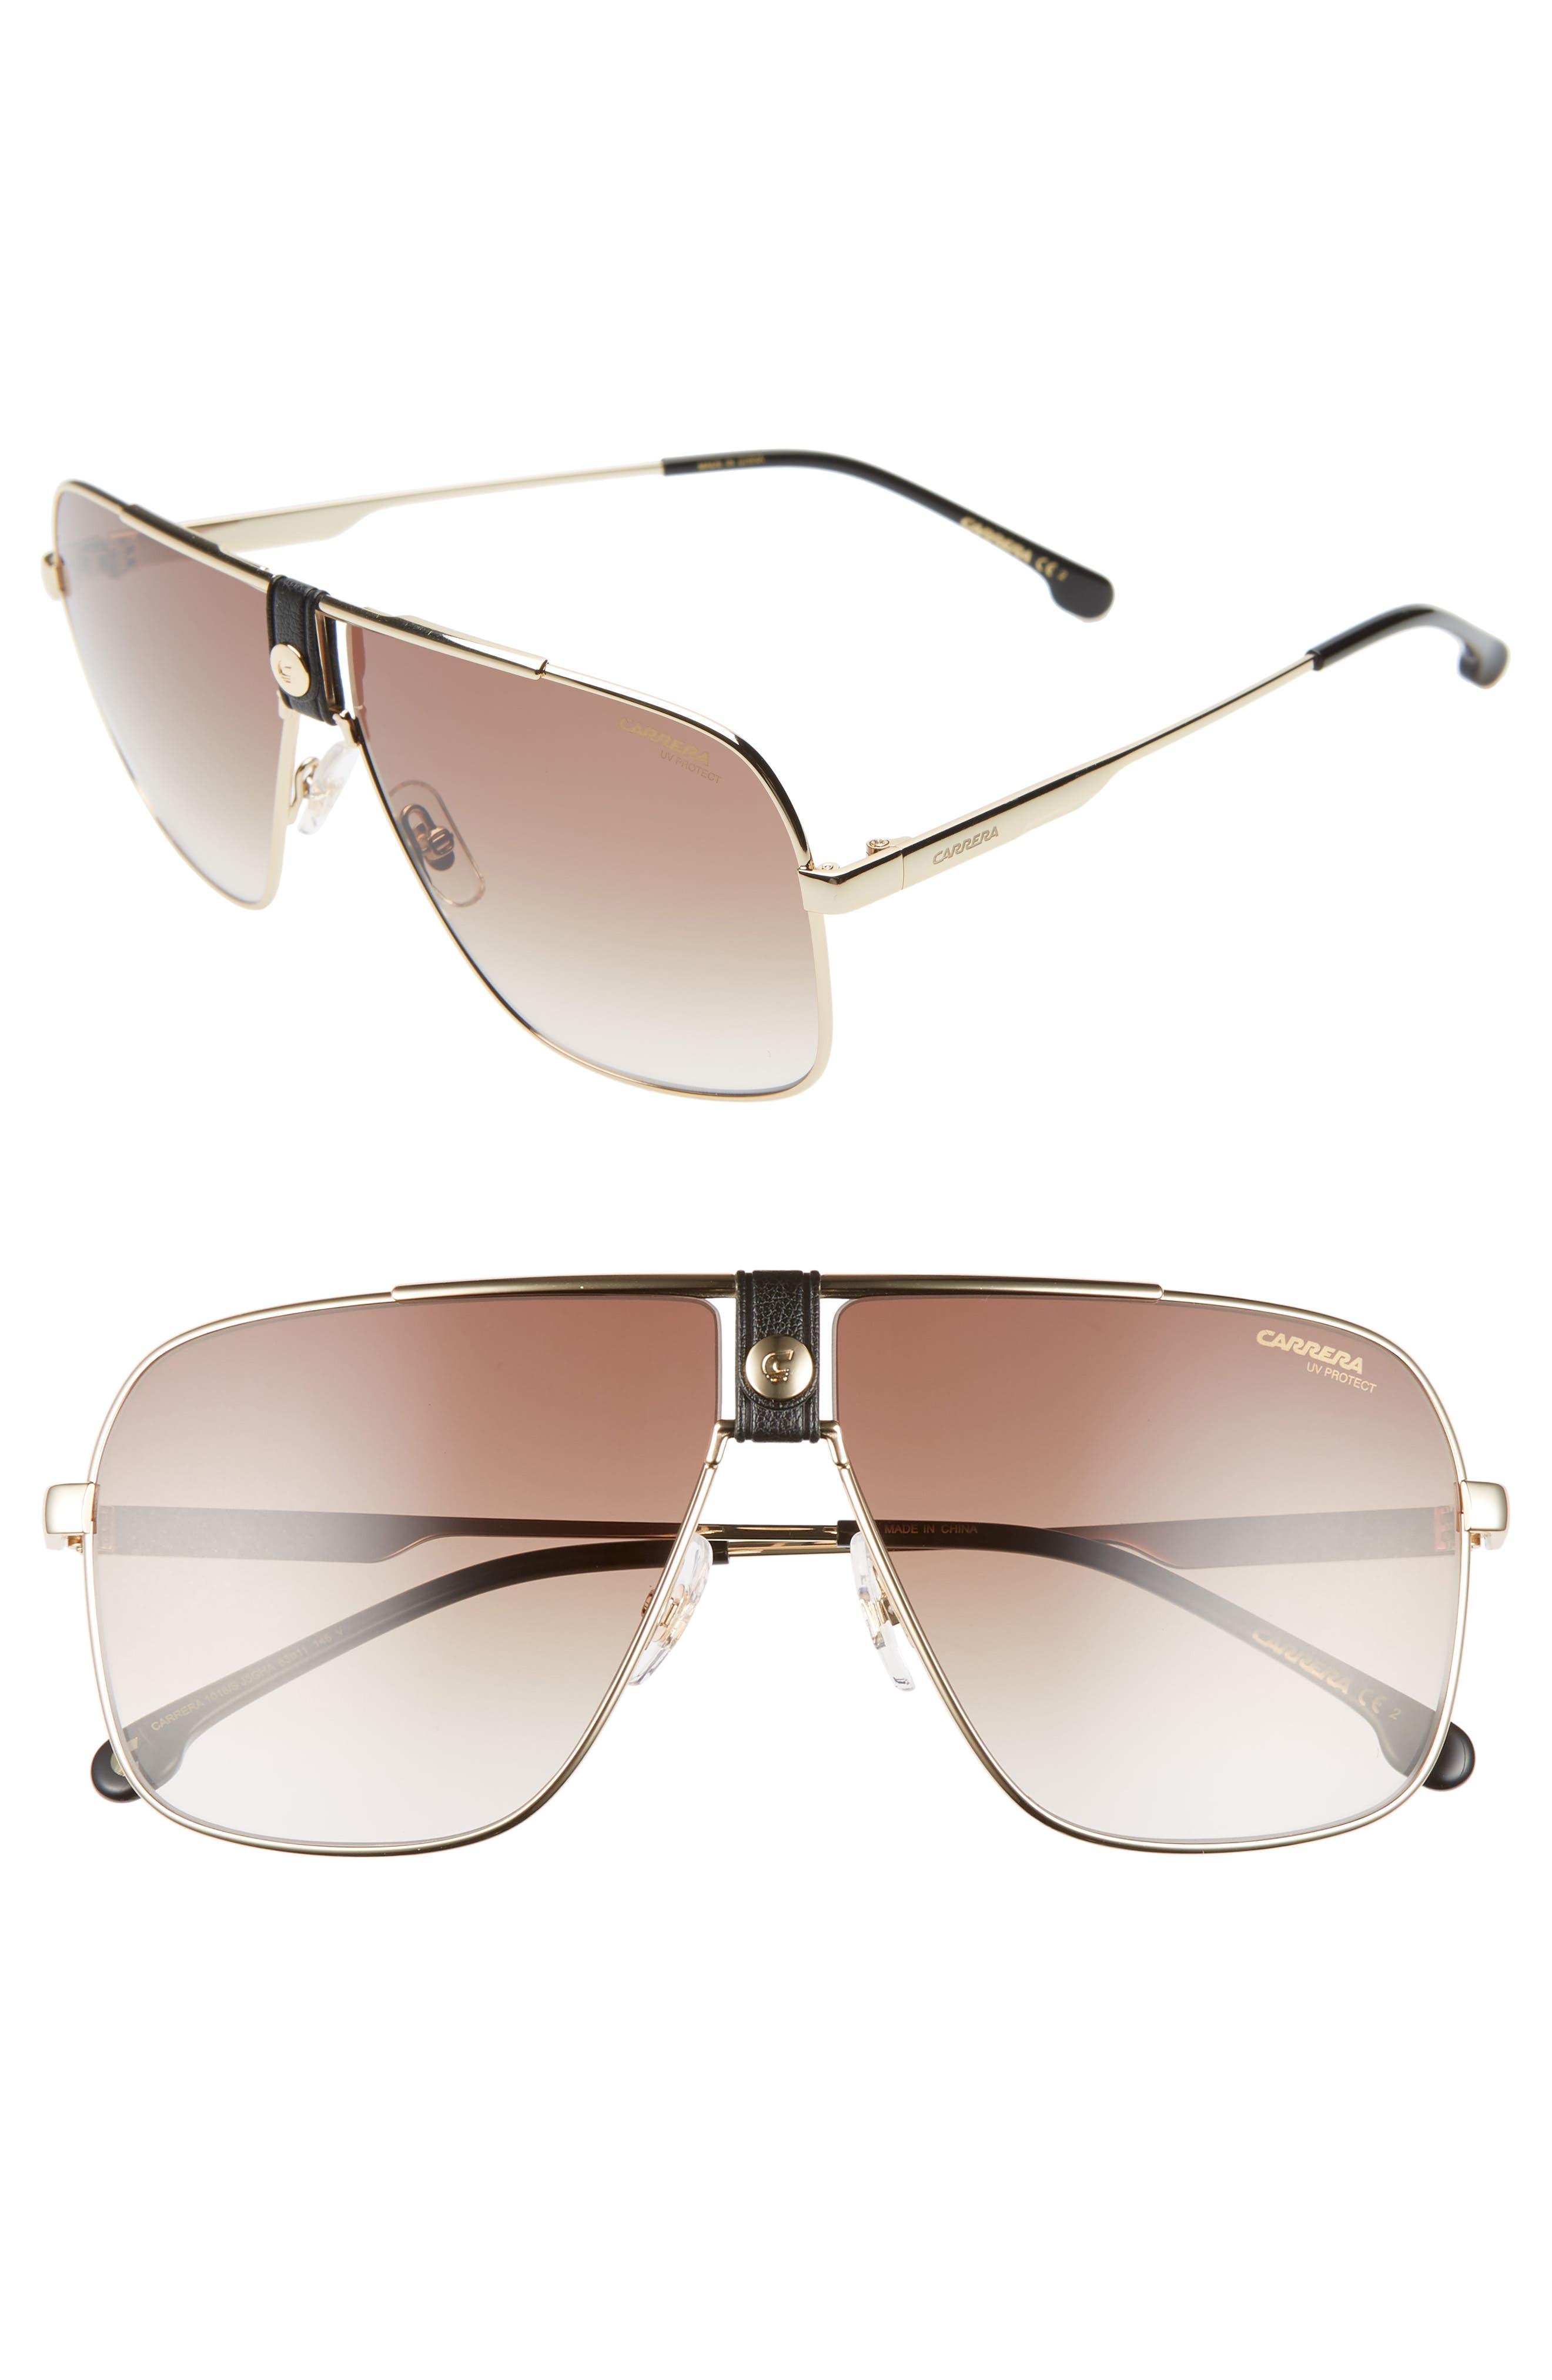 Carrera Eyewear 6m Navigator Sunglasses - Gold